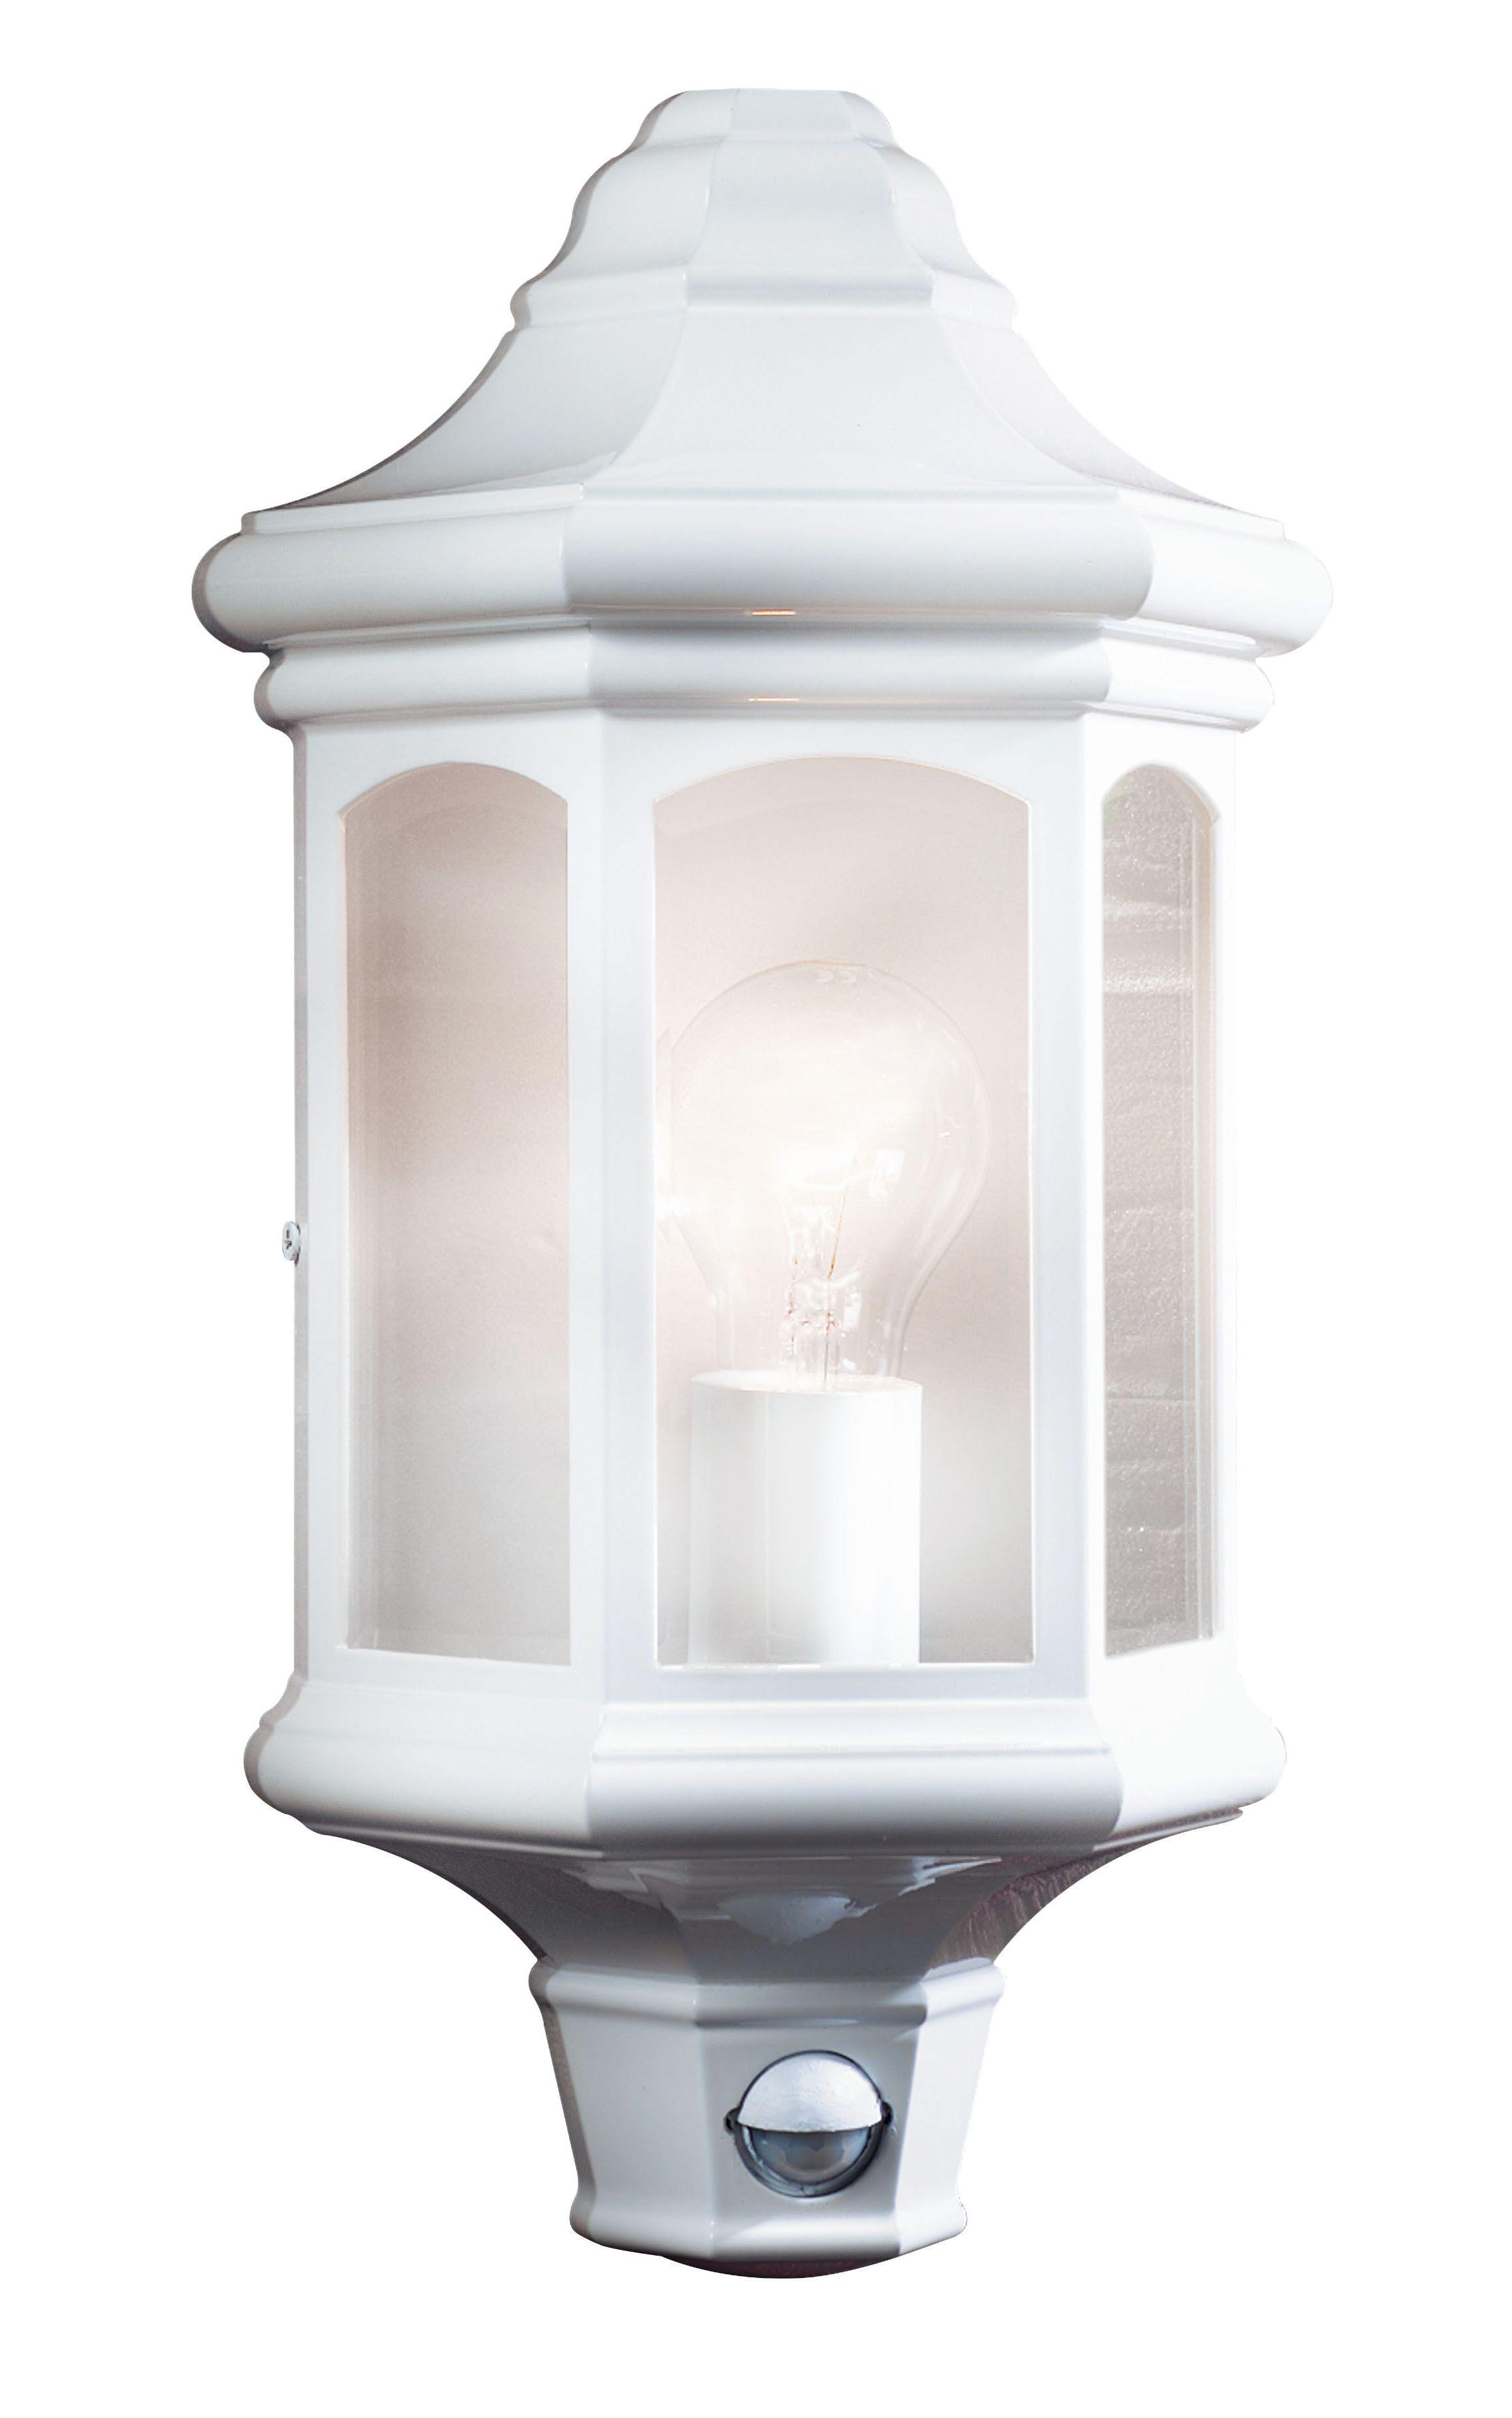 Pir lights b q for Housse blooma